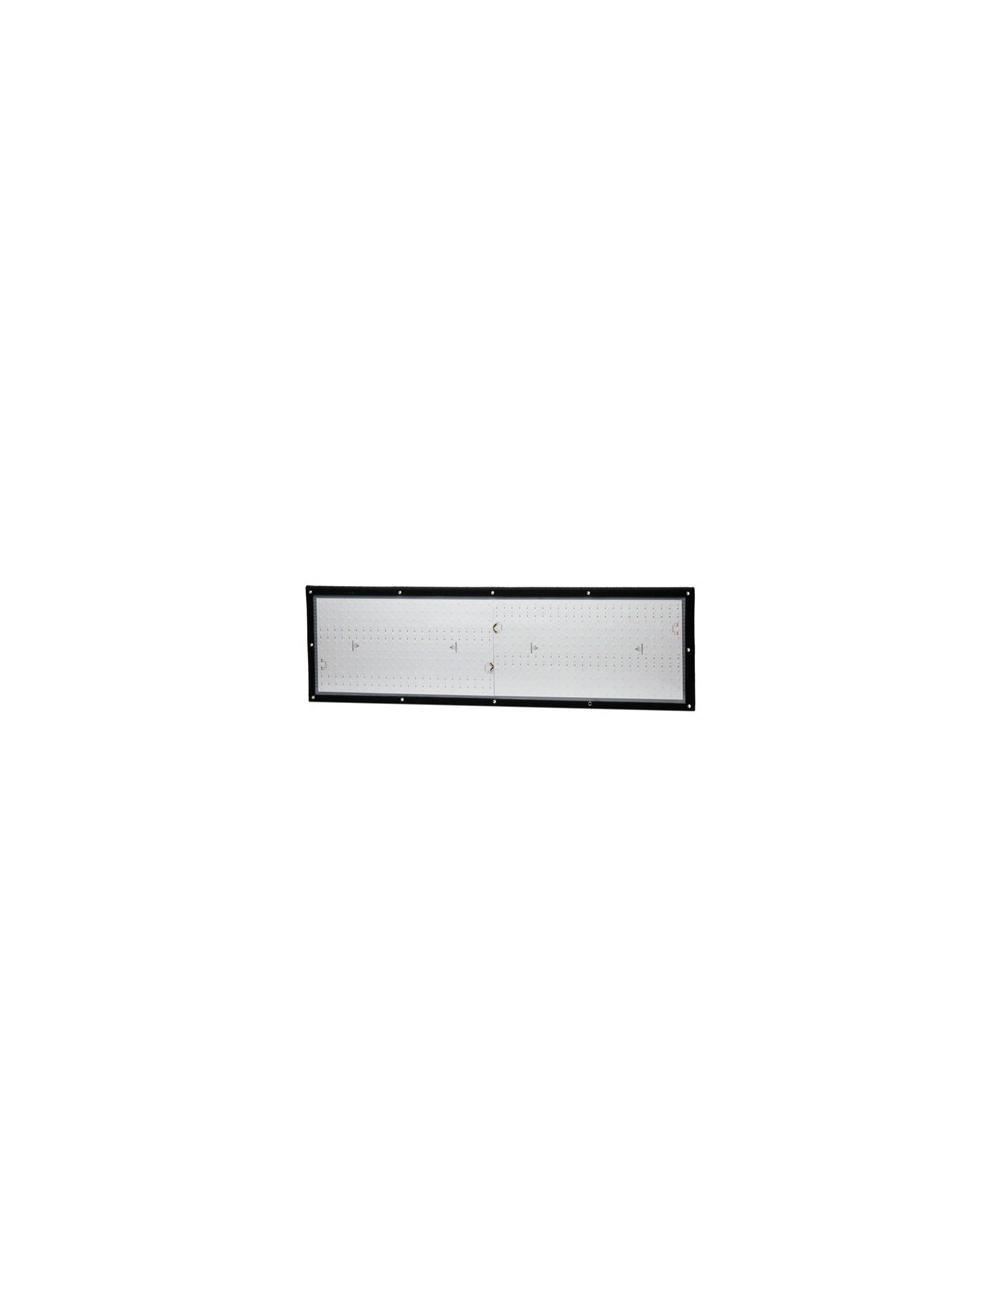 LiteGear LiteMat 2L S2 Daylite